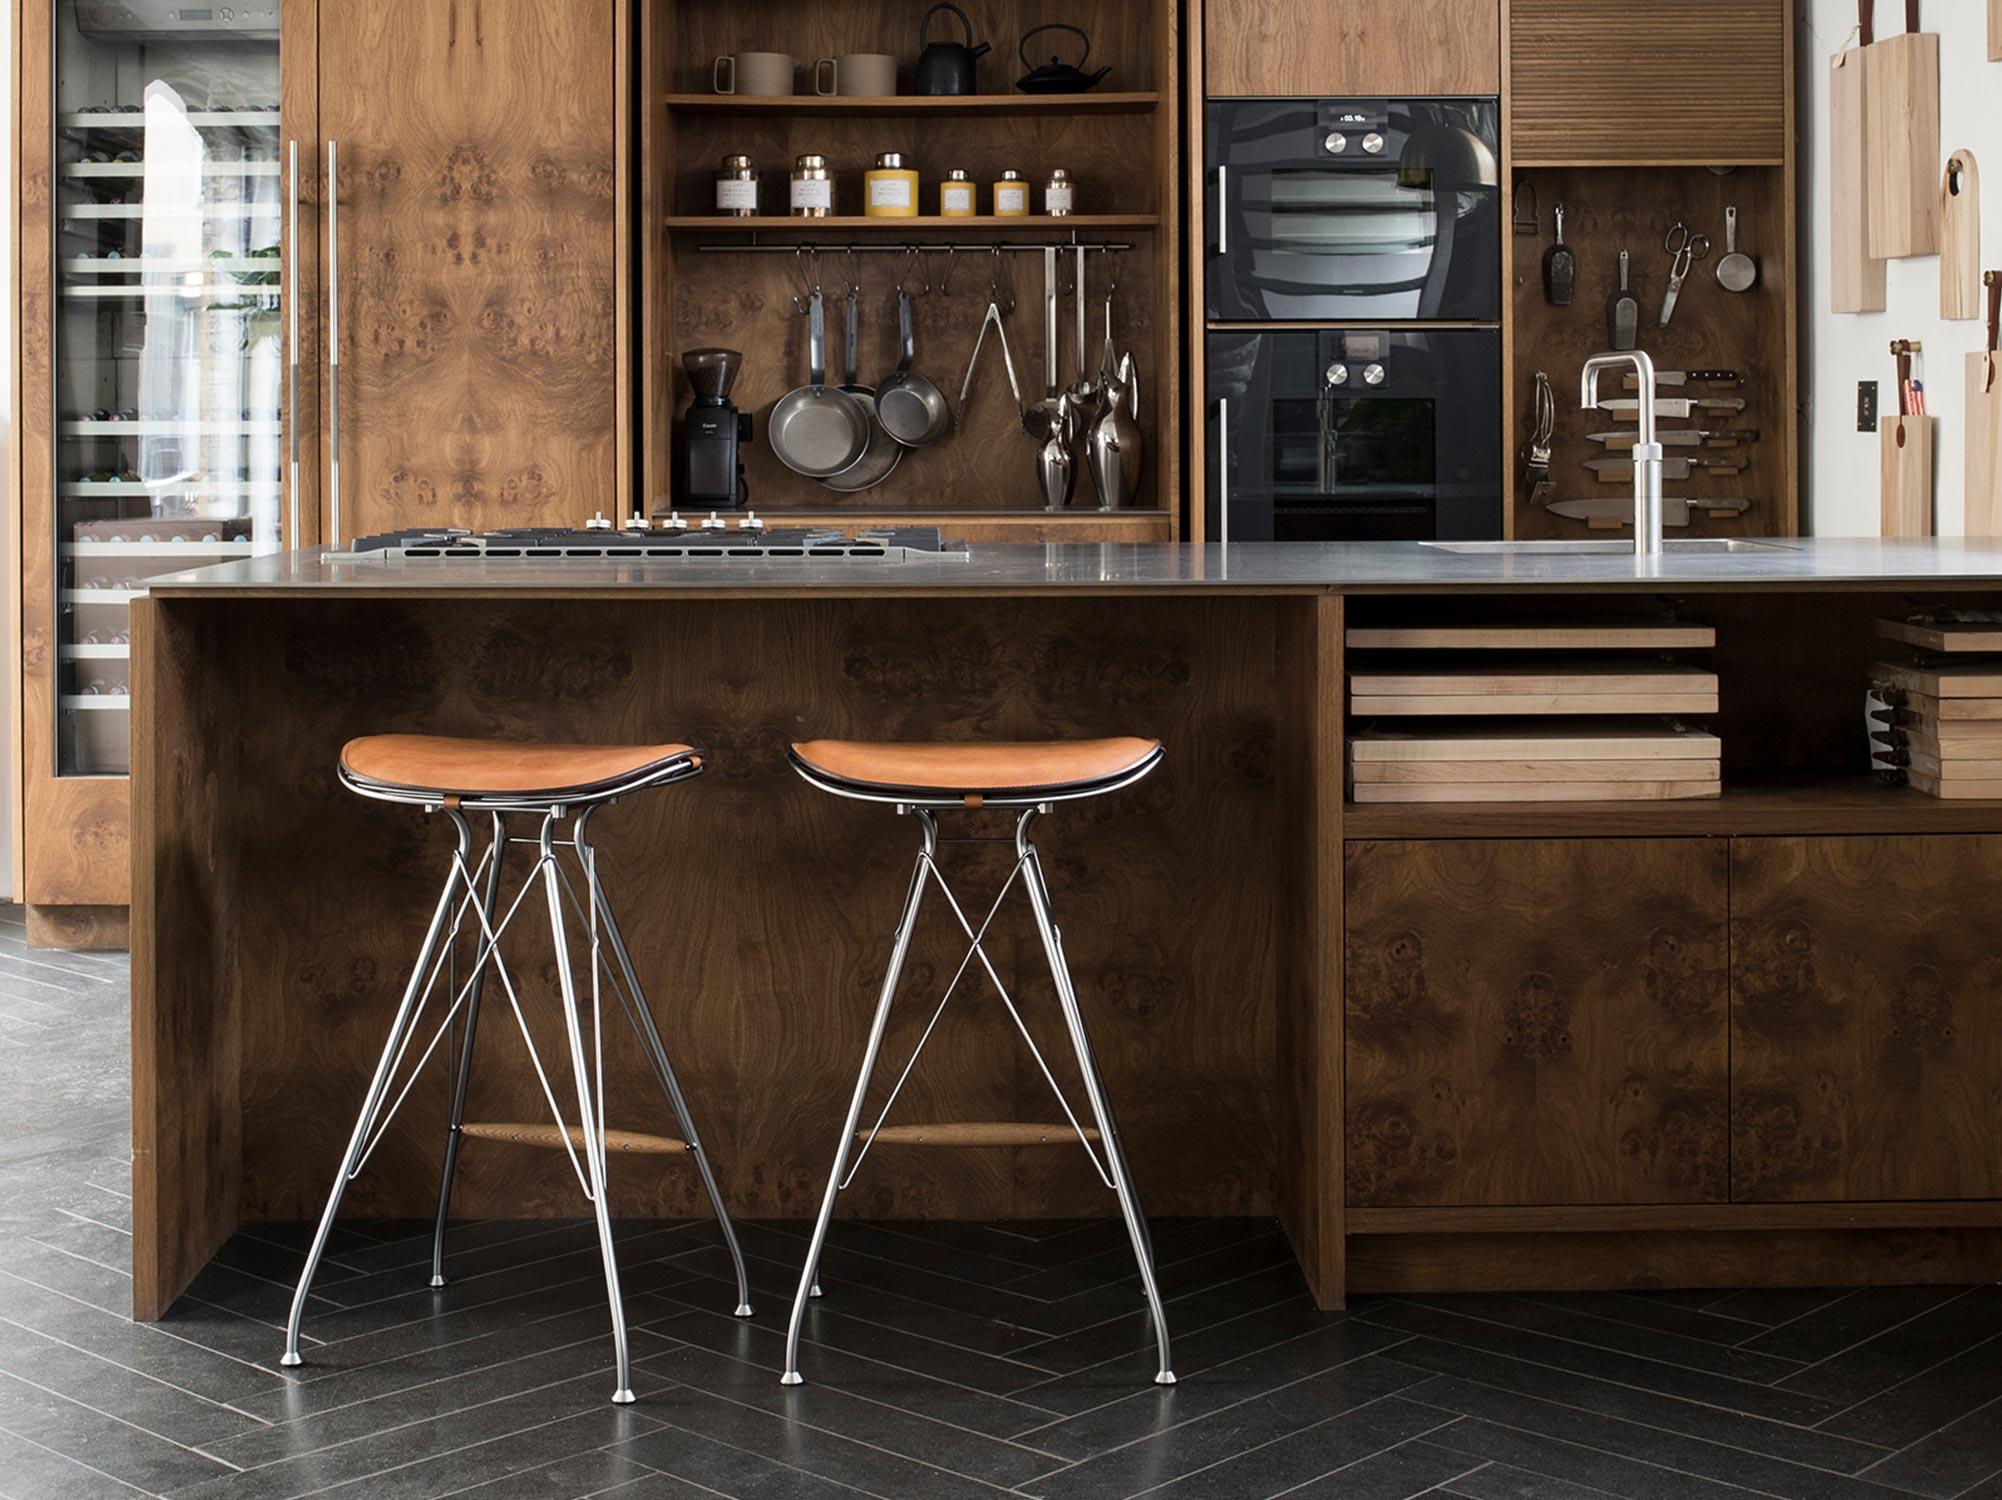 Wire-Bar-Stool-Kitchen-Counter-Overgaard-Dyrman